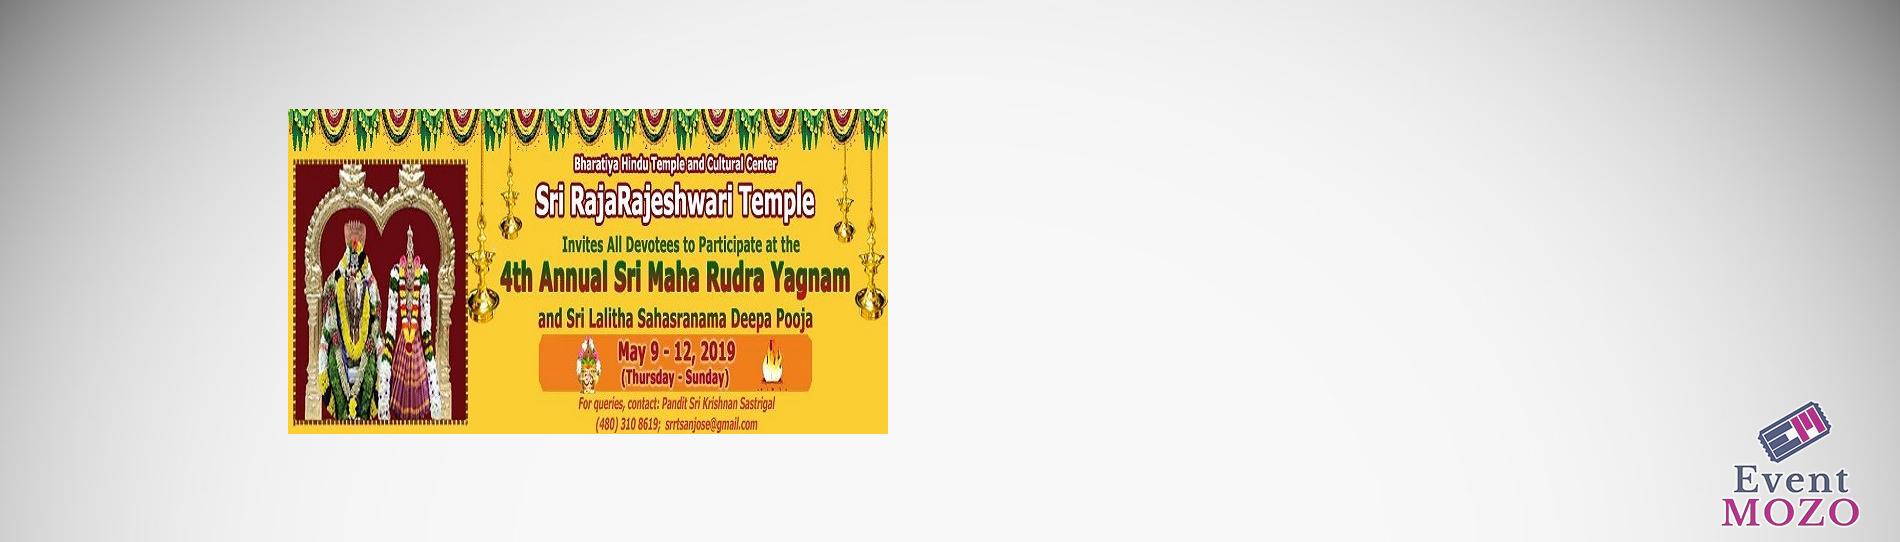 EventMozo Annual Maharudram & Deepa Pooja